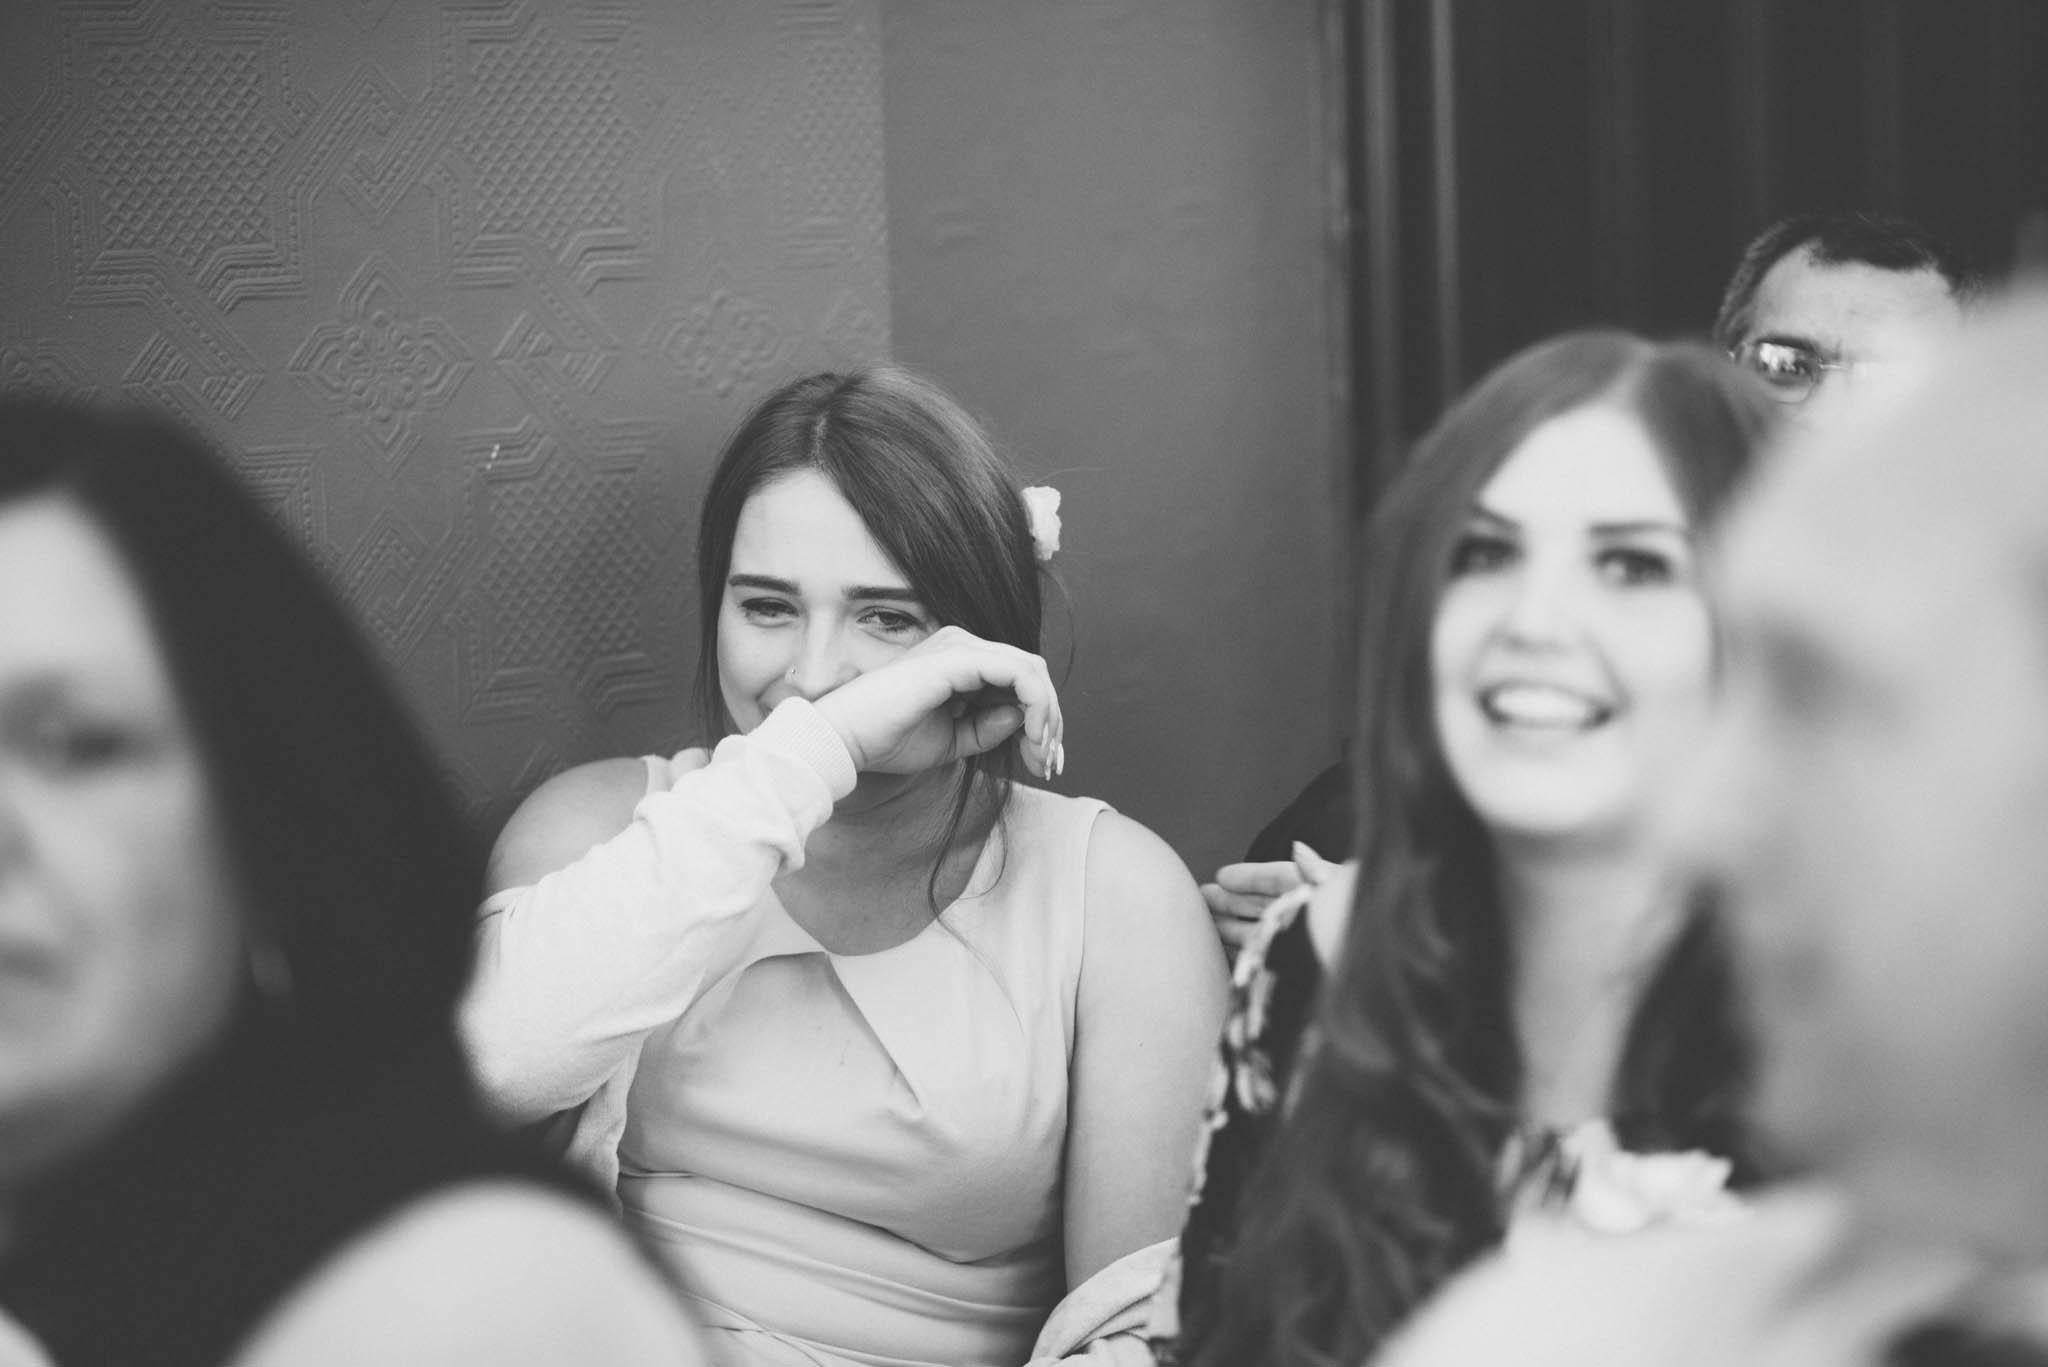 crying2-wedding-blog-scott-stockwell-photography-end-2017.jpg